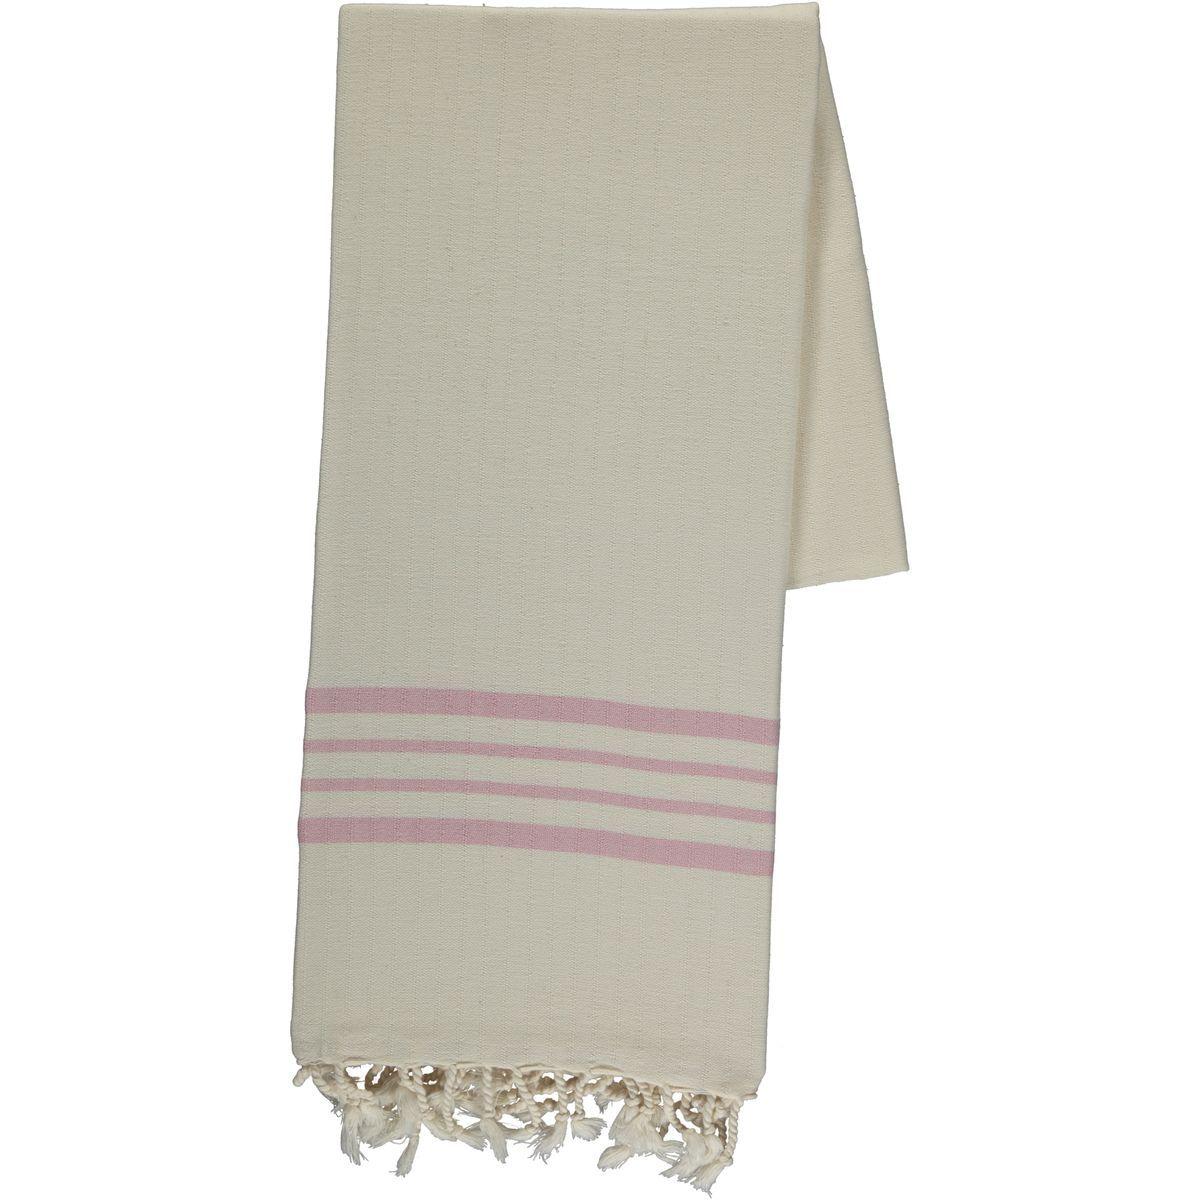 Peshtemal Sultan - Rose Pink Stripes